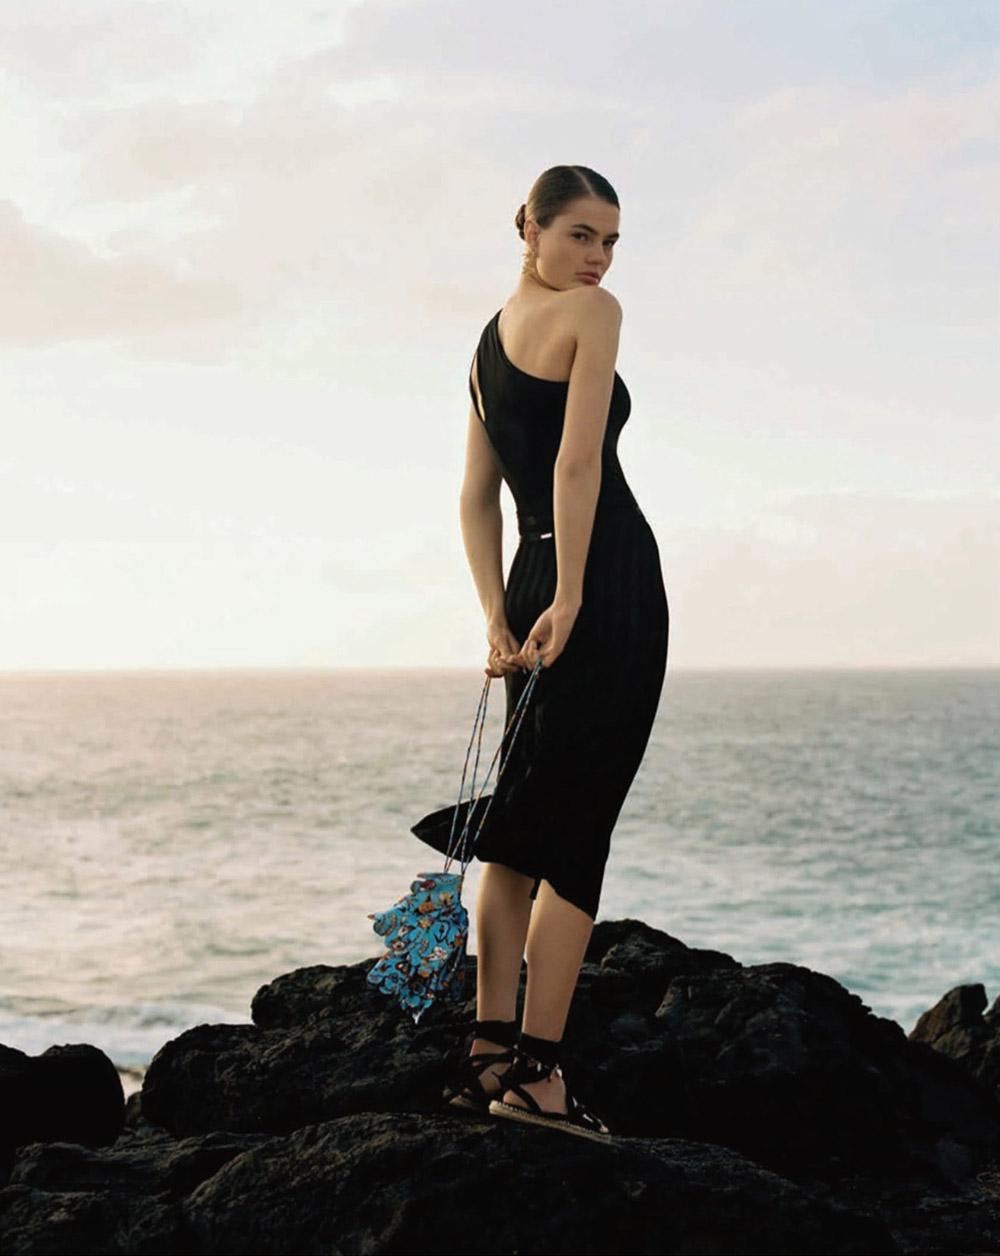 Myrthe Bolt by Anya Holdstock for Vogue Spain June 2020